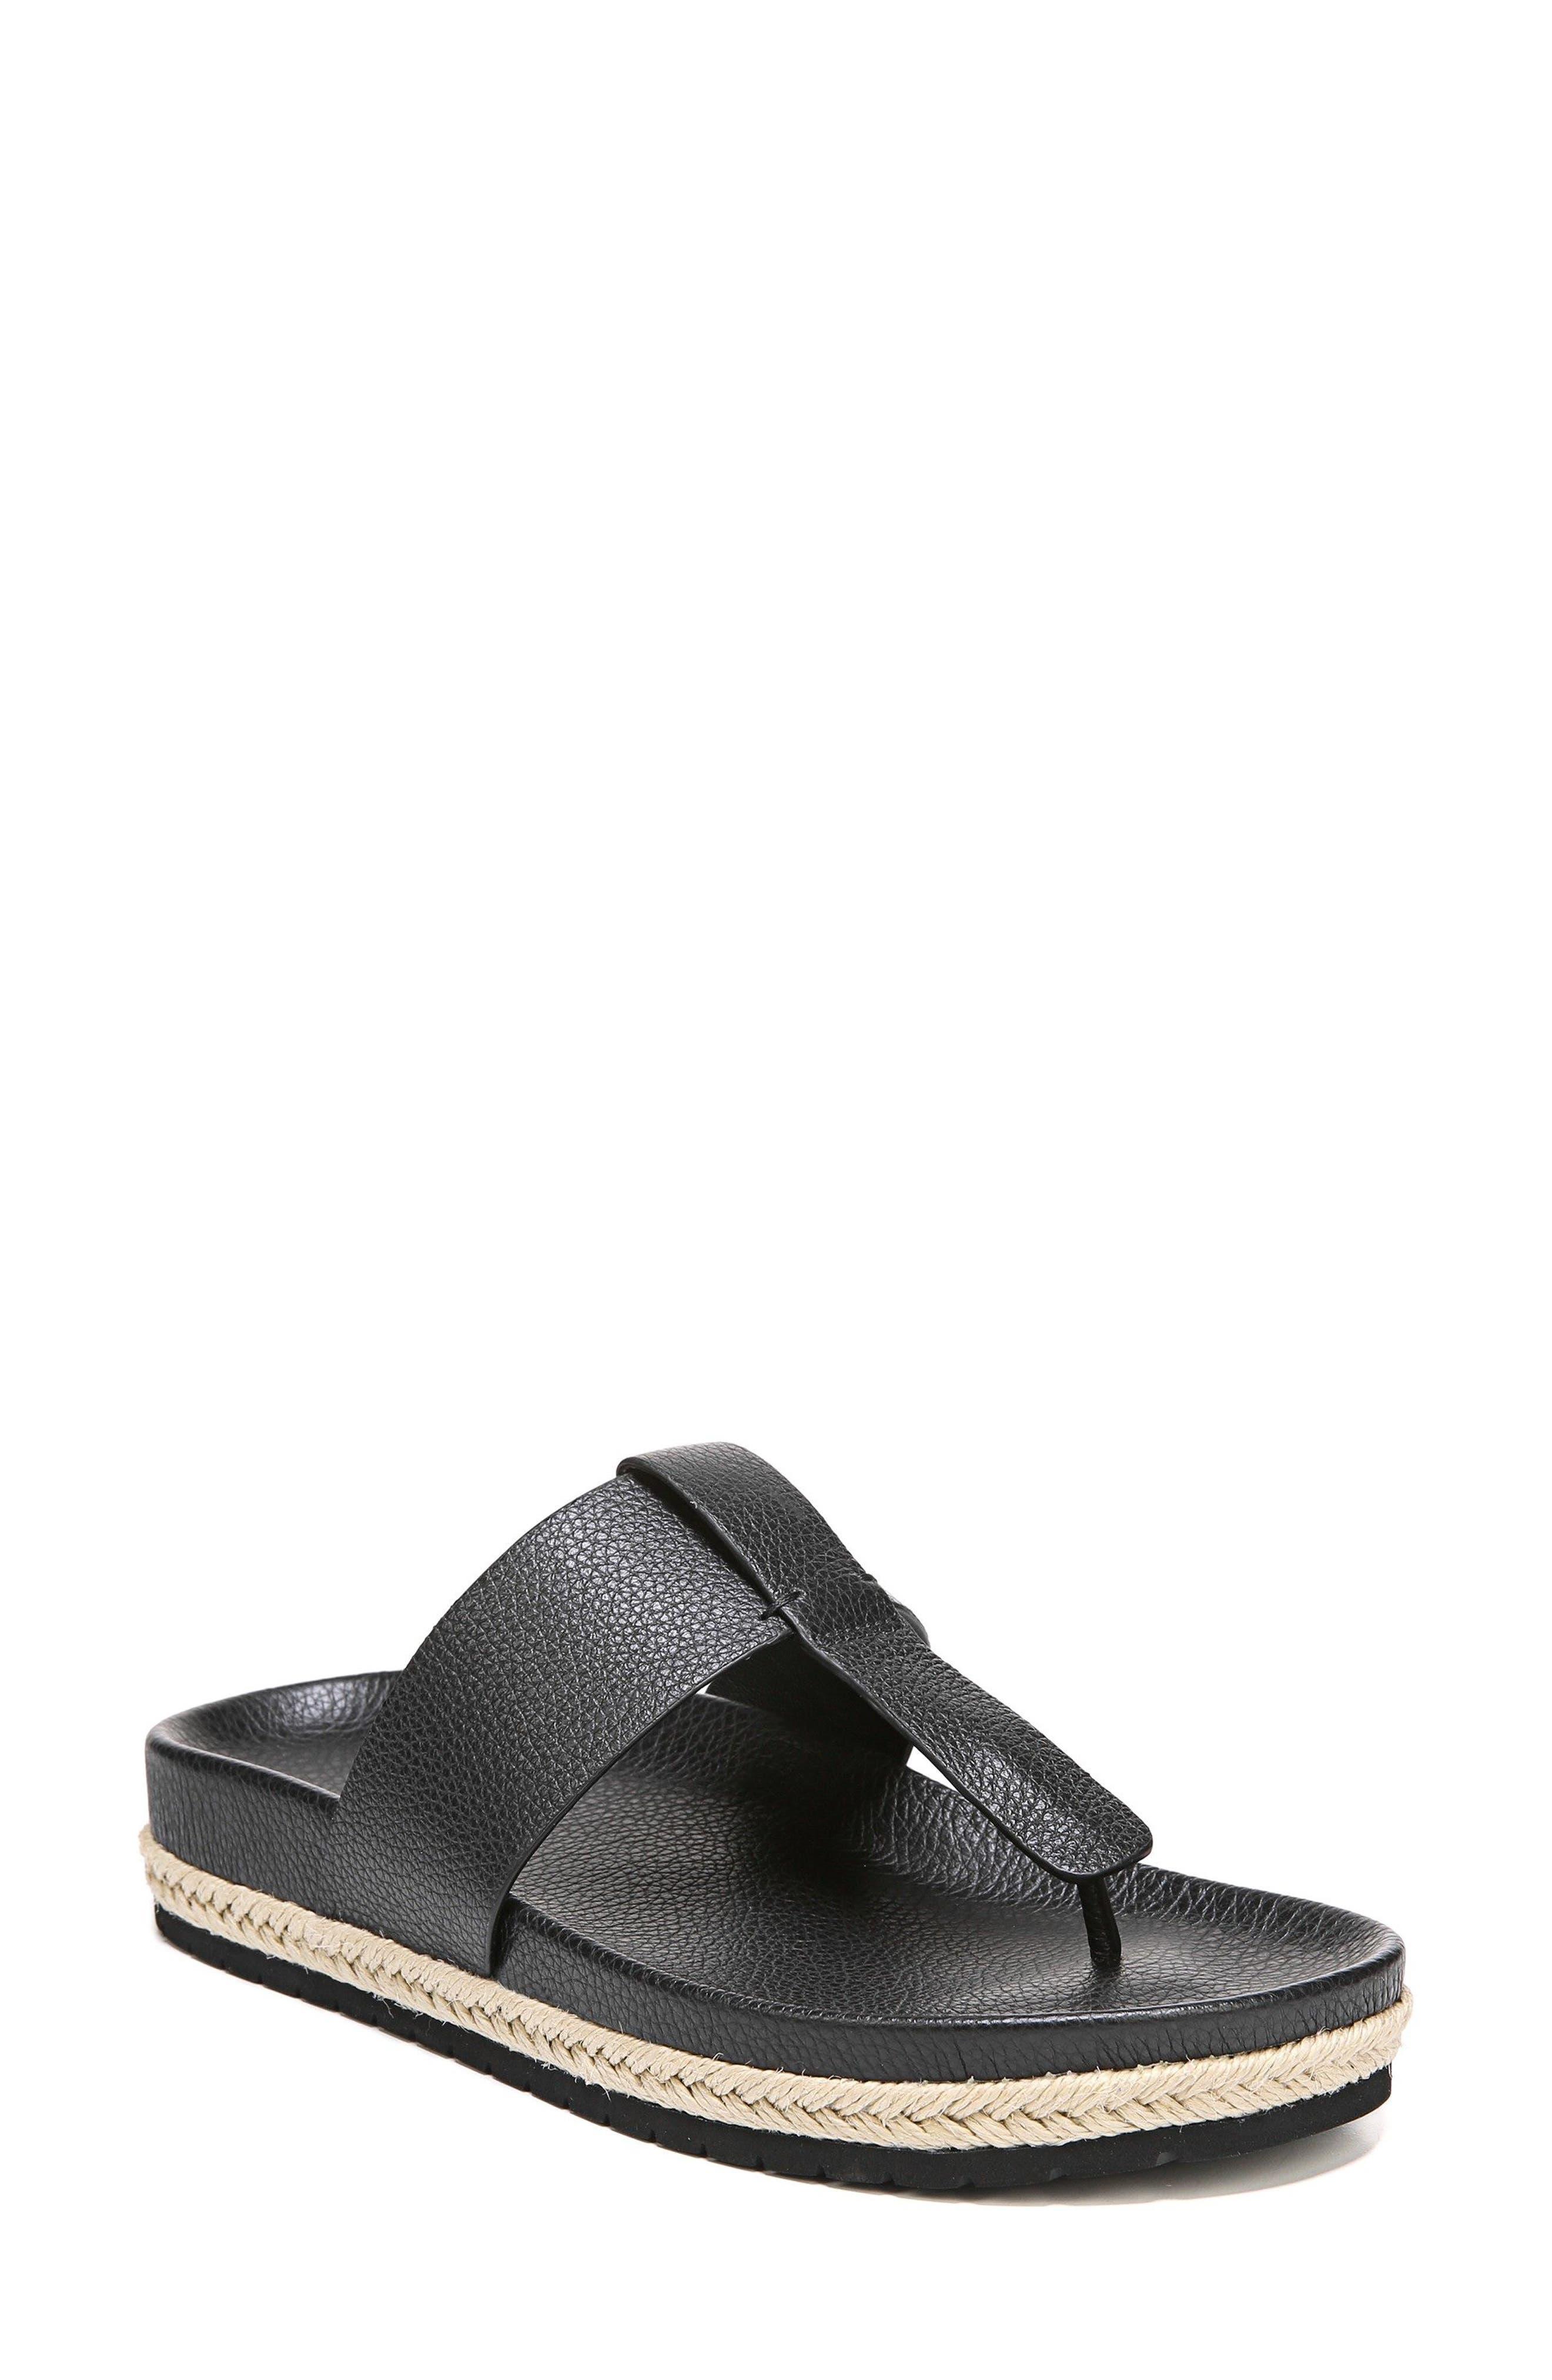 Main Image - Vince Avani T-Strap Flat Sandal (Women)